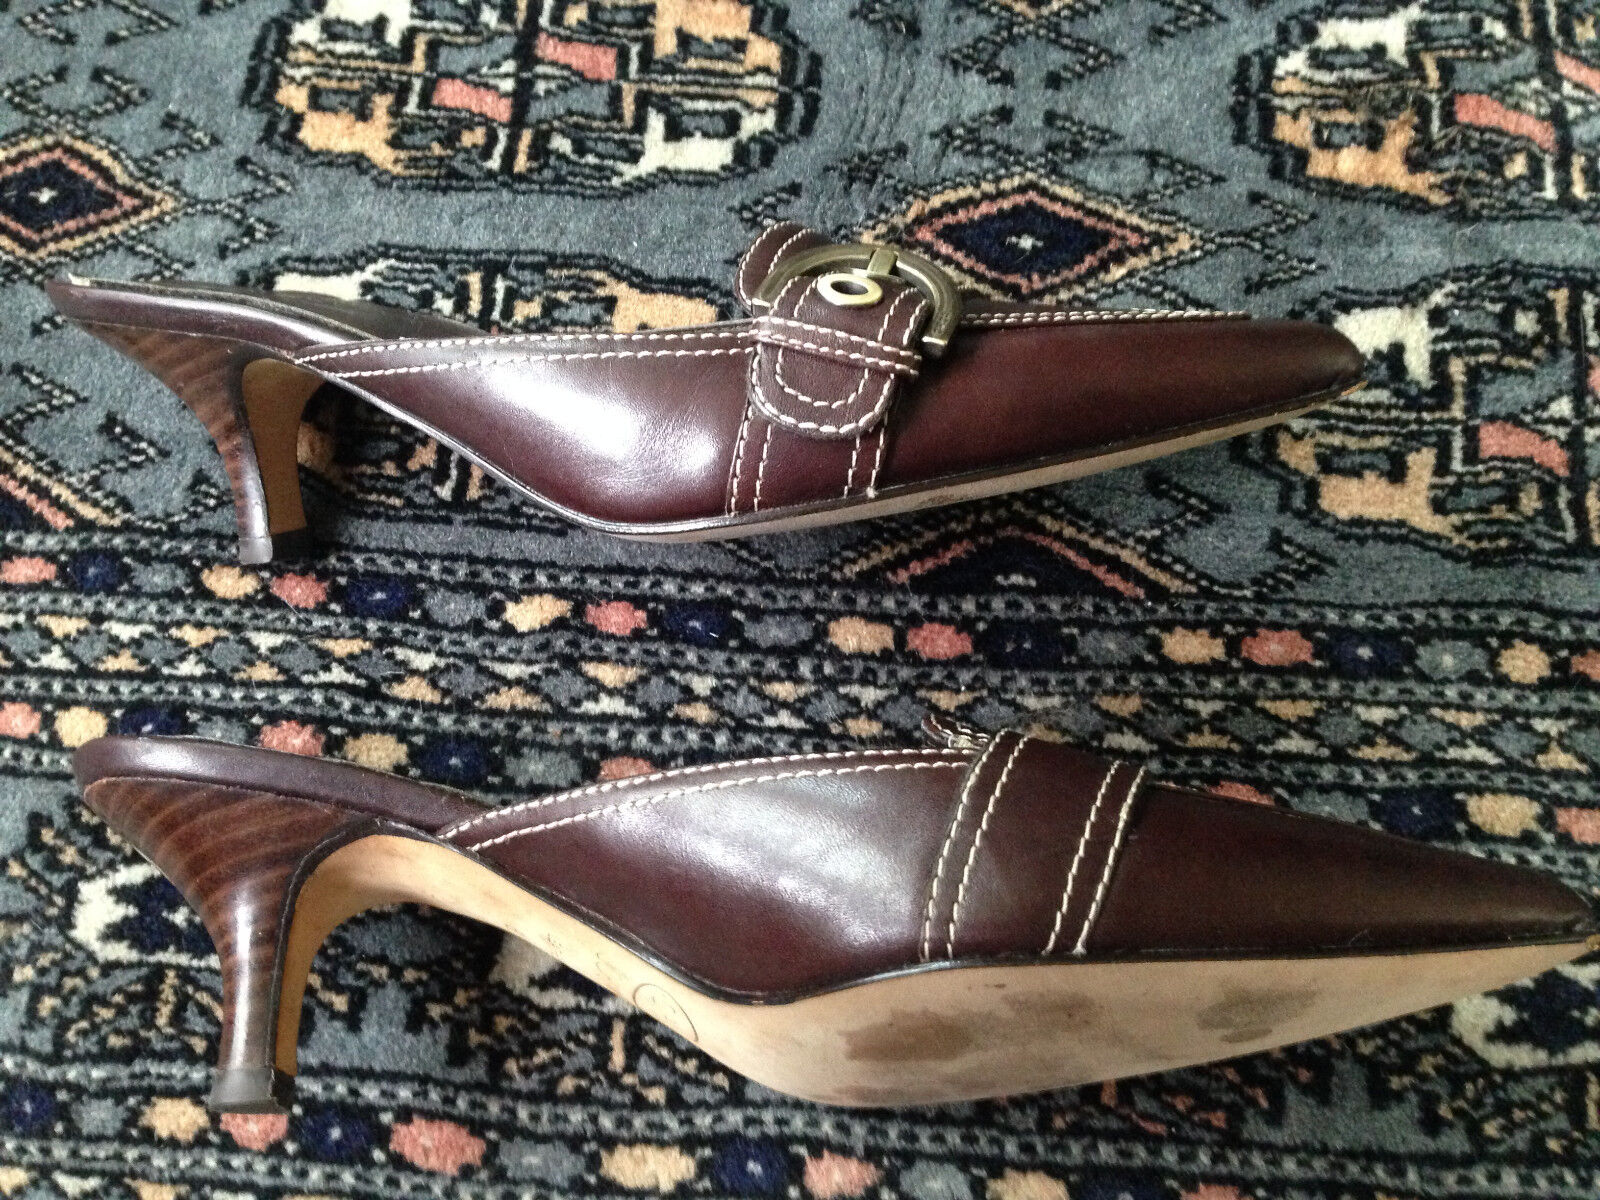 Joan and David Circa Mahogany Leather Kitten Heel Mules, Sz Sz Sz 6M, MINT CONDITION dd3f43